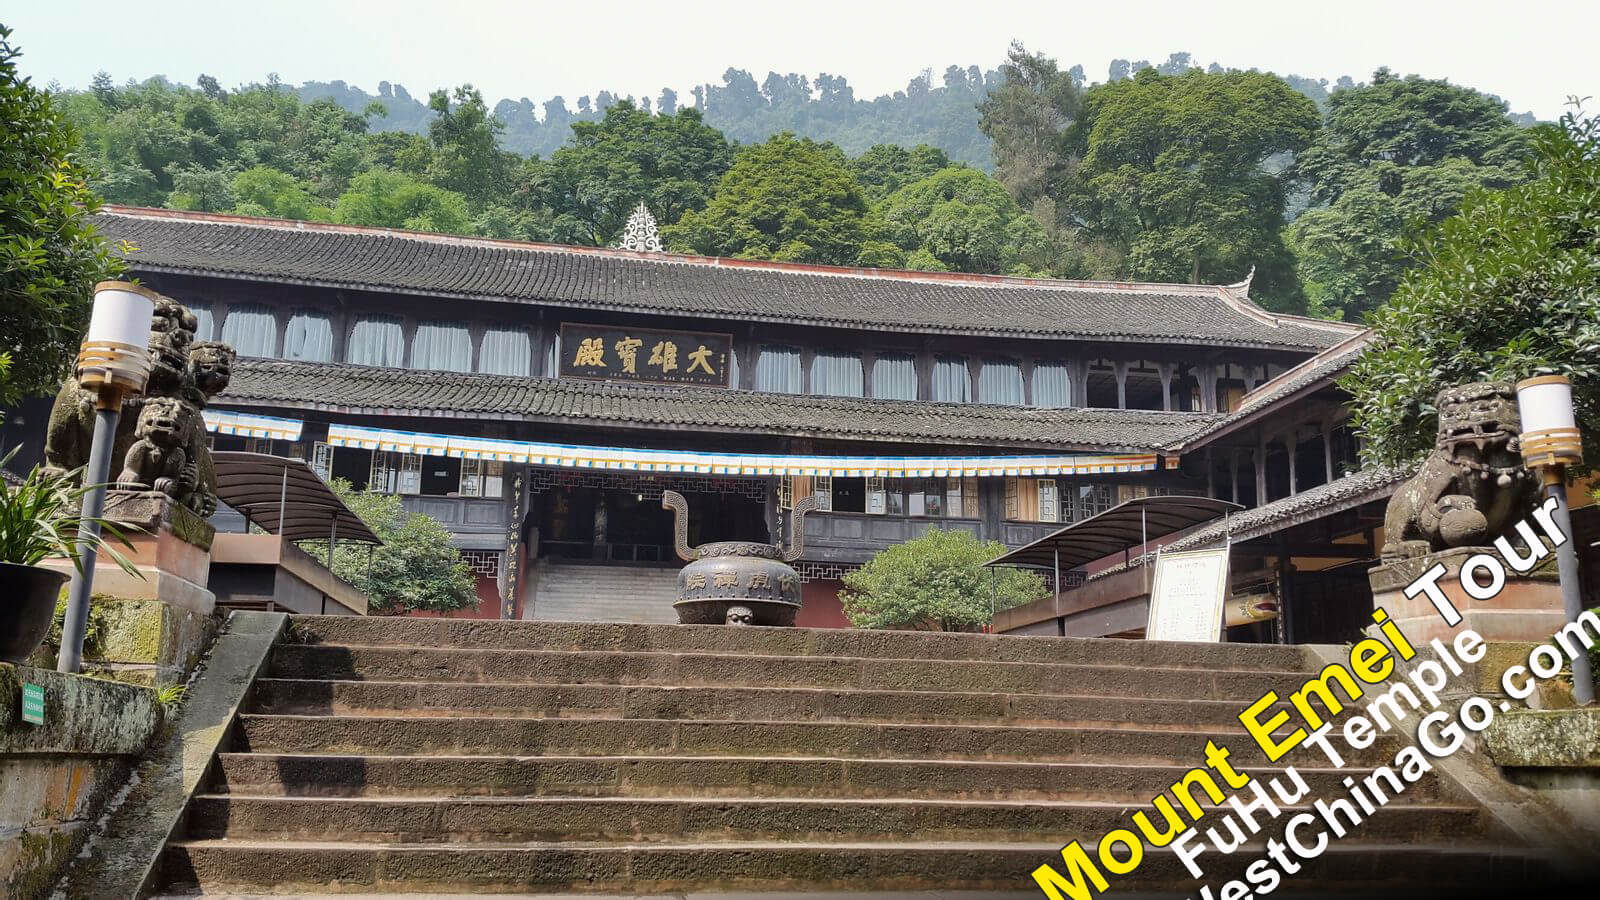 Mount Emeishan tour: FuHu Temple